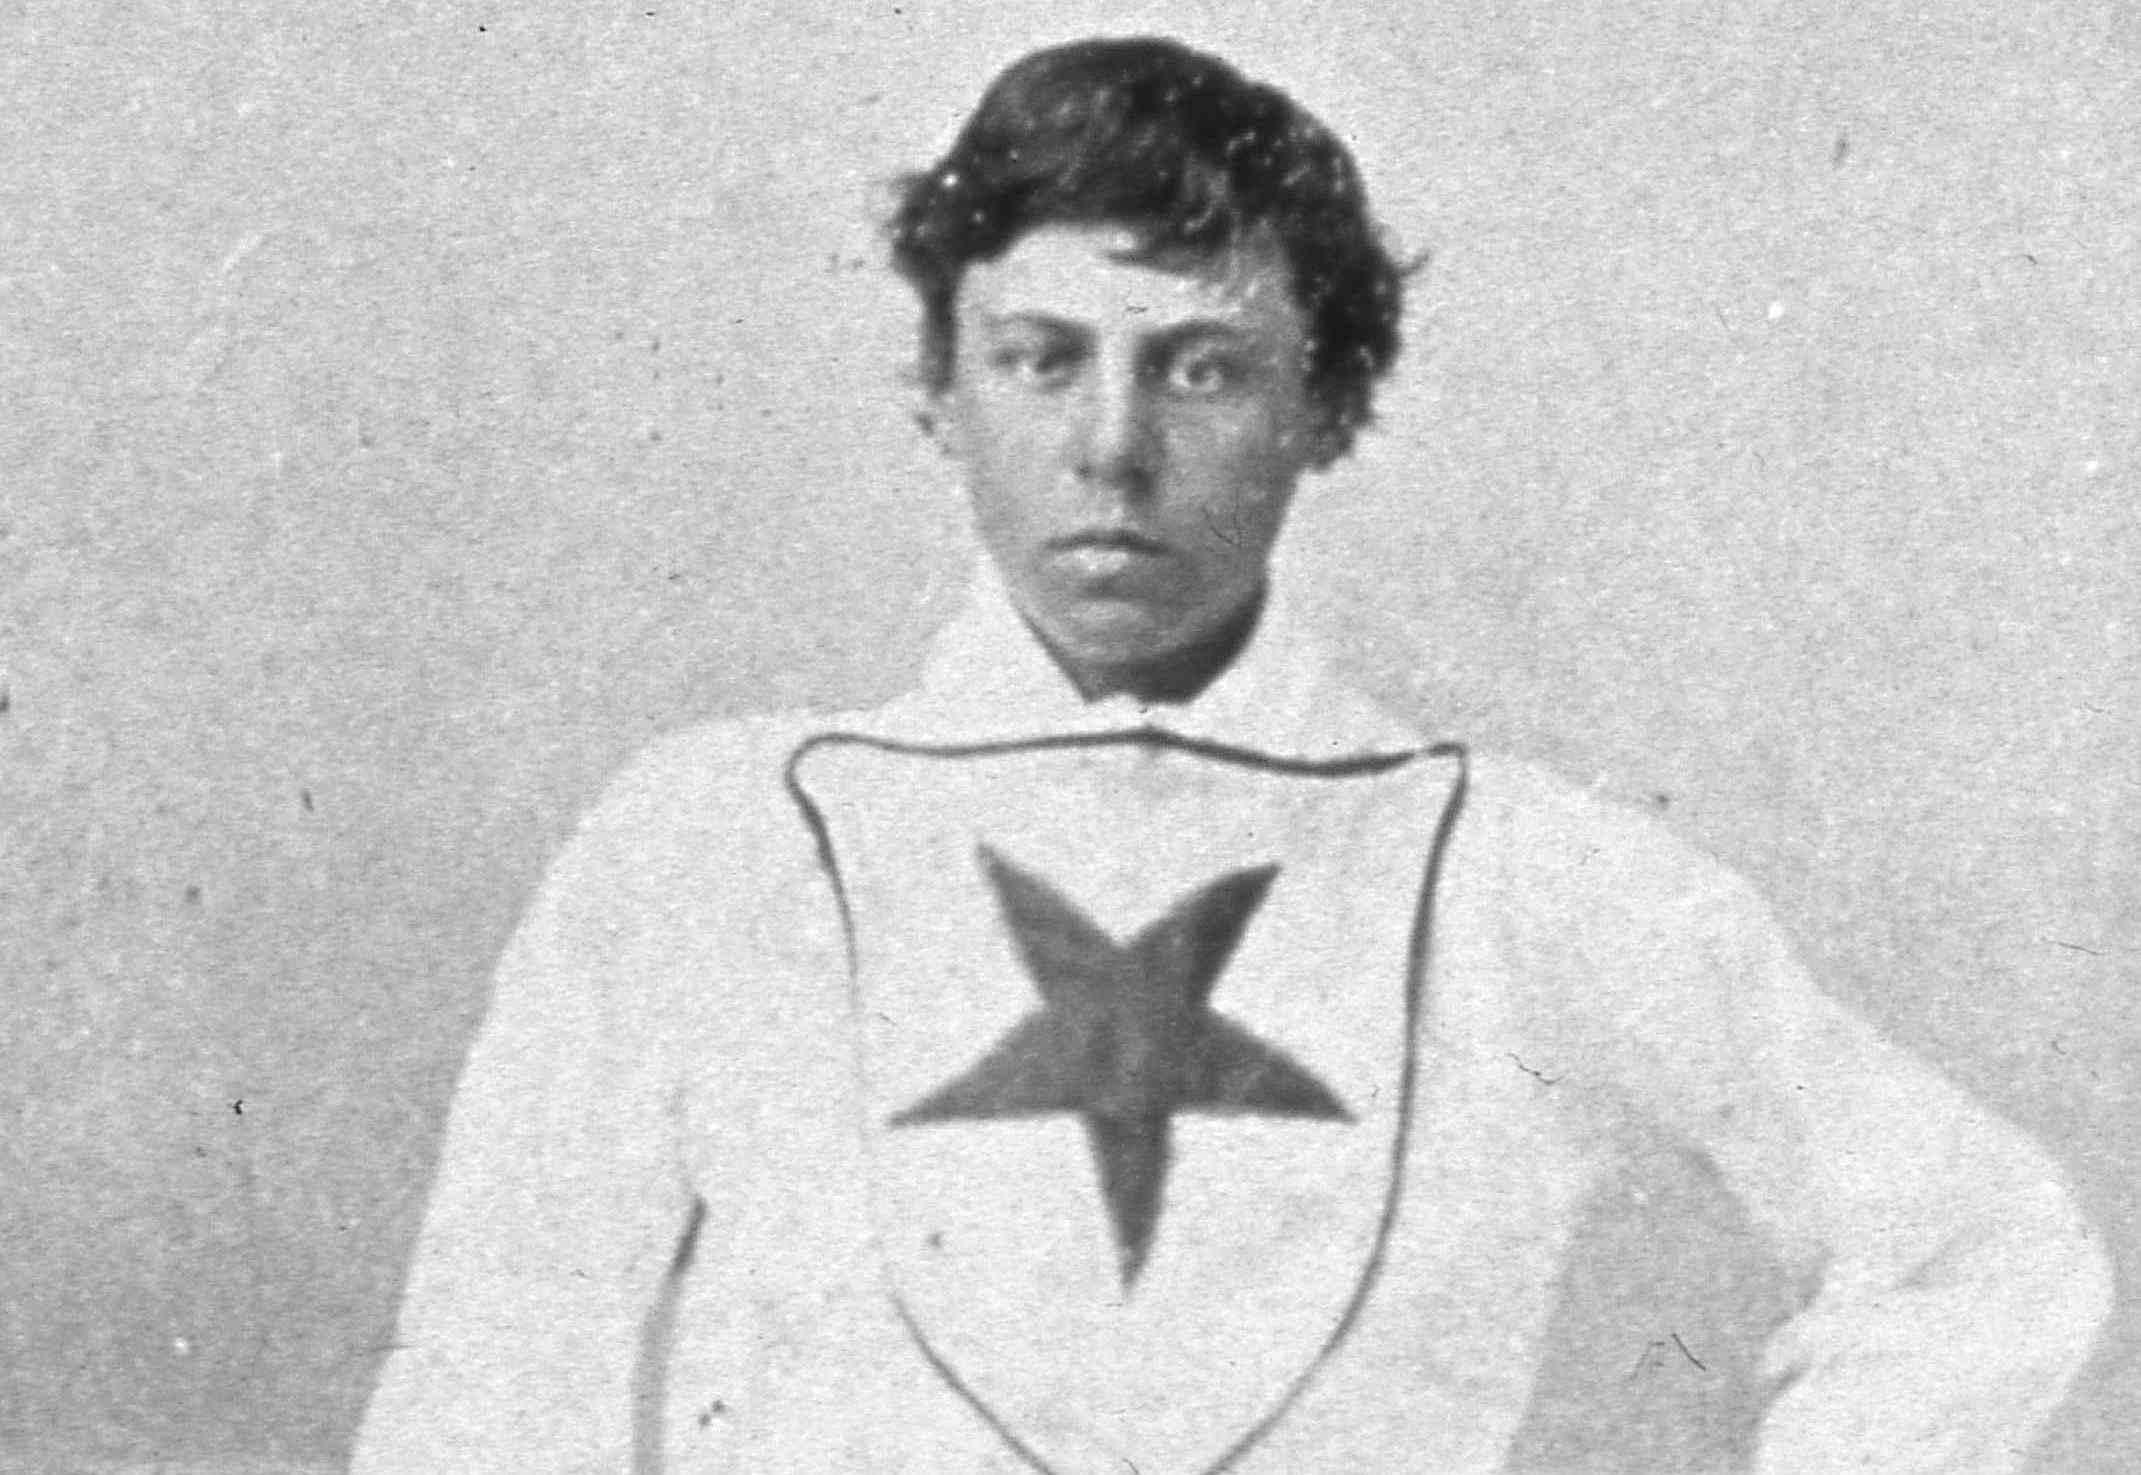 19th century baseball pitcher Candy Cumming